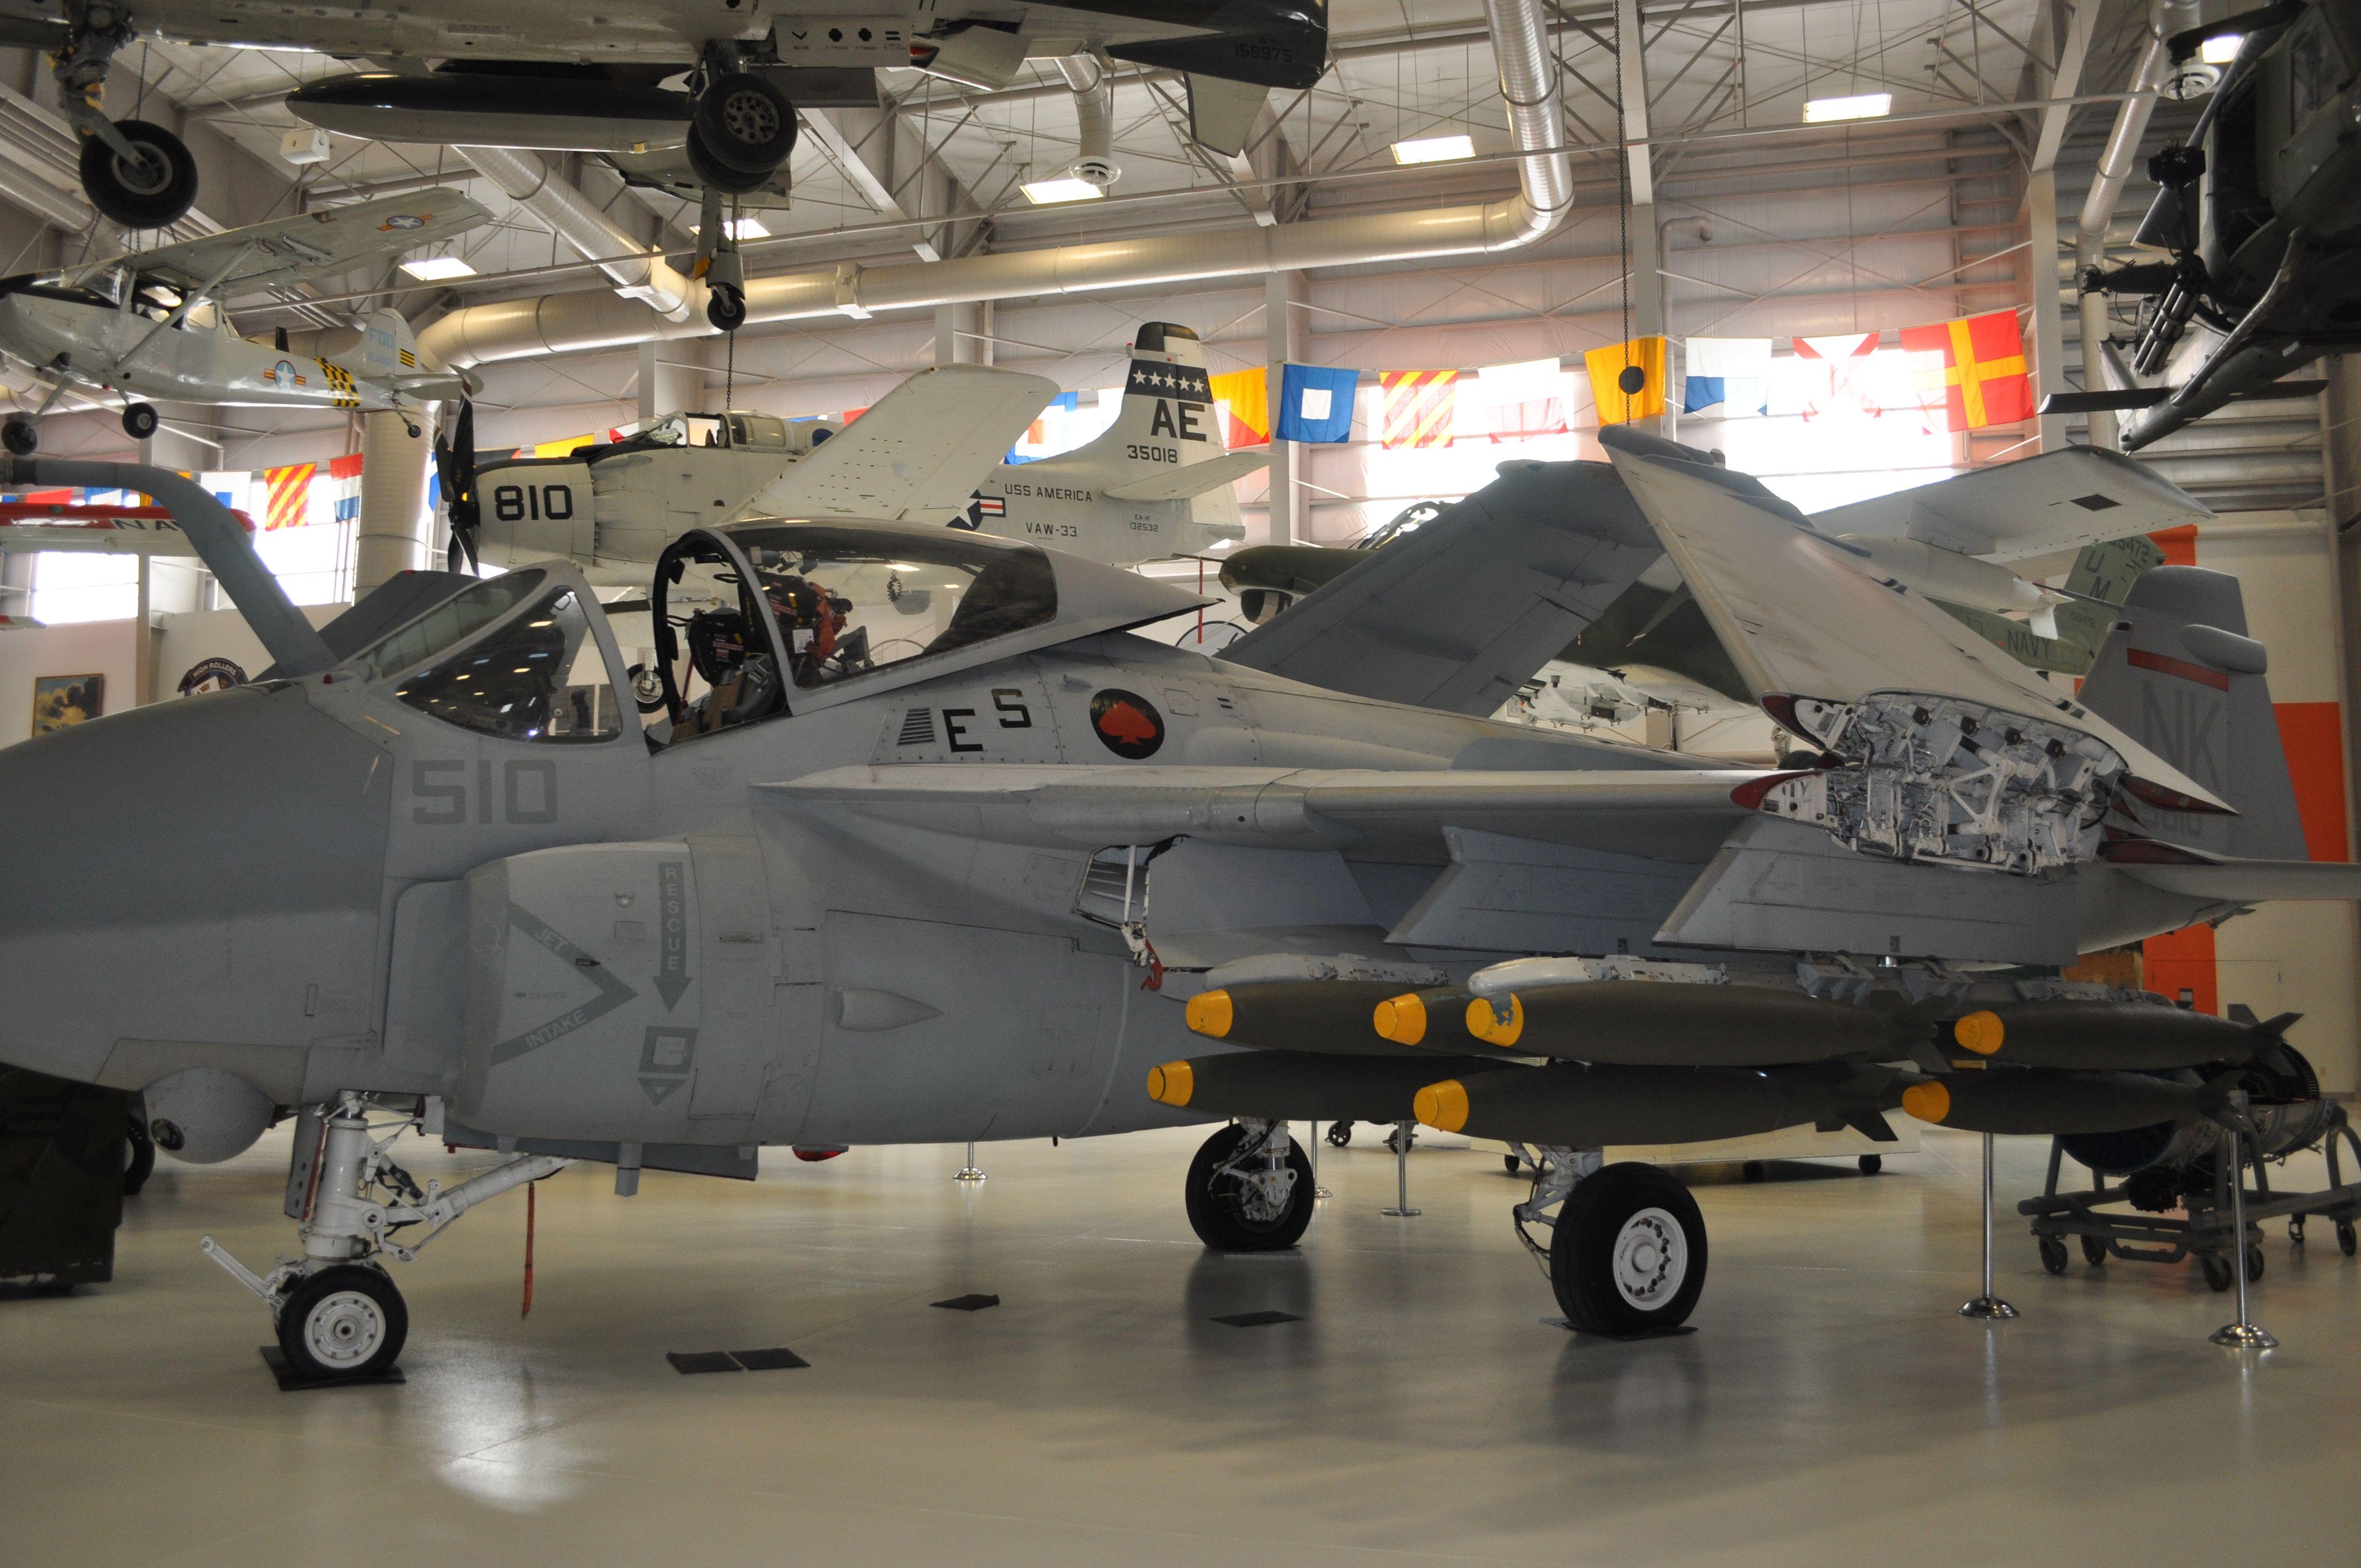 Pensacola Aviation Museum (254) A-6 Intruder